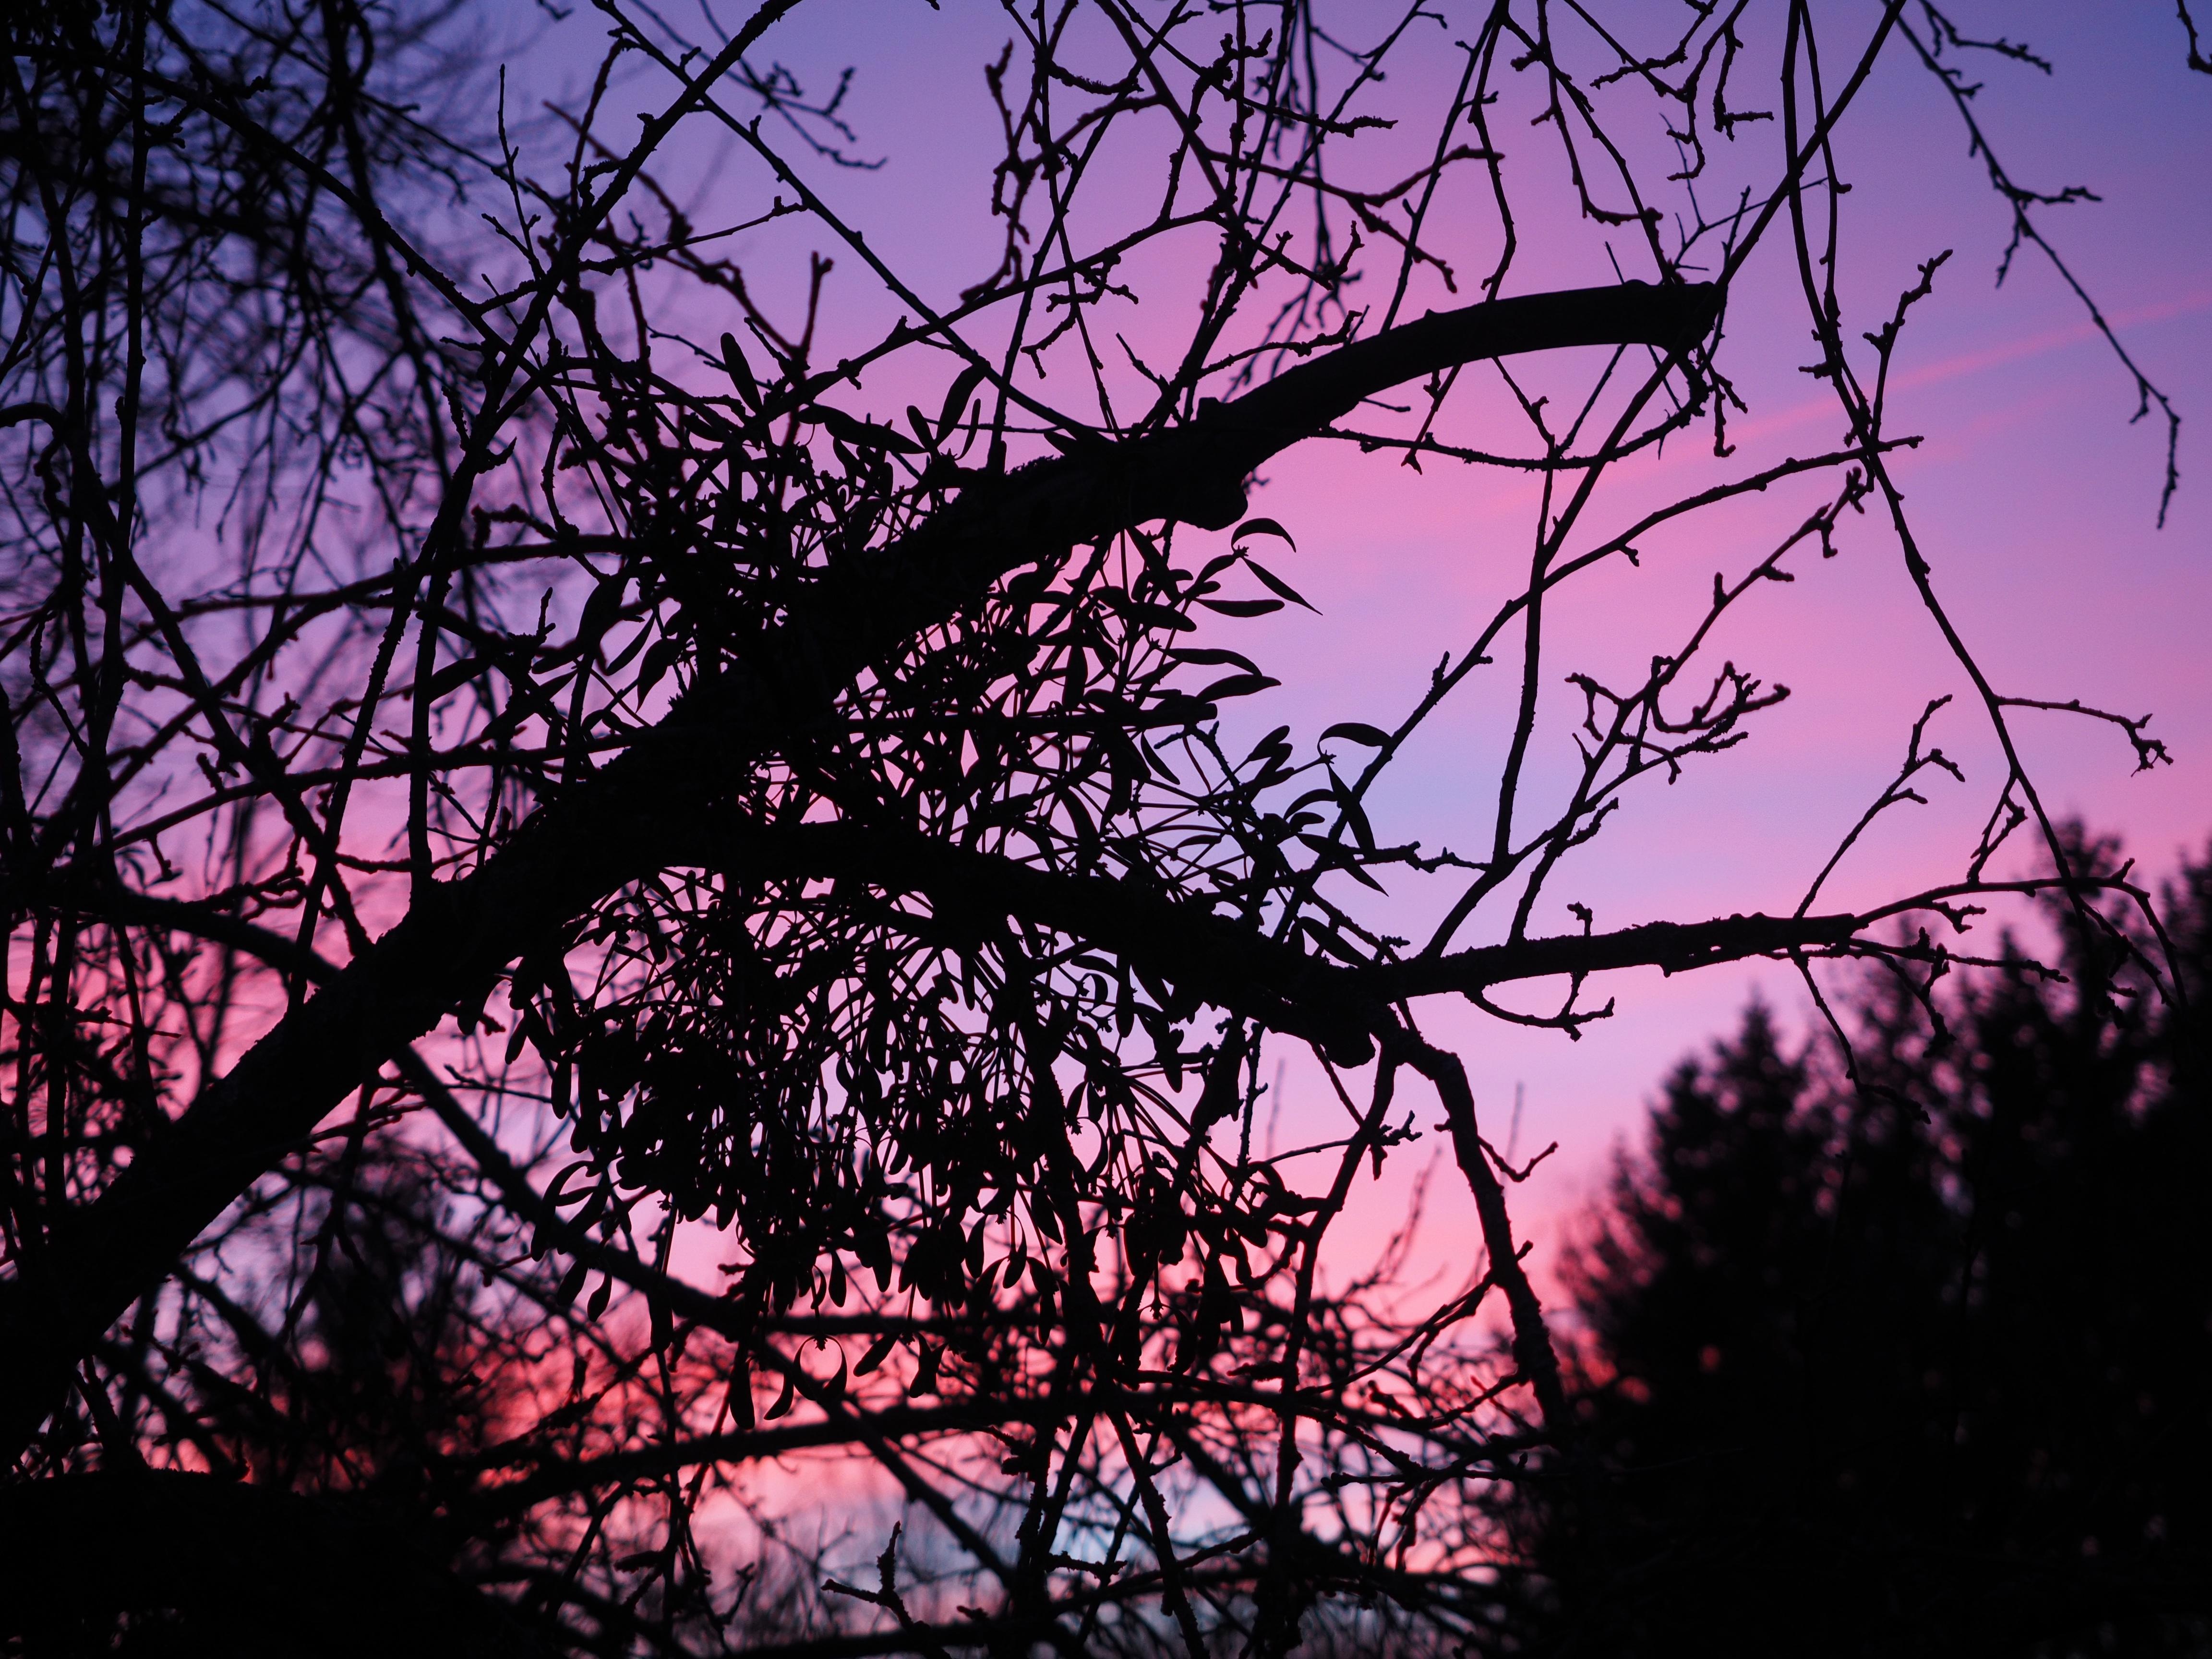 Free Images : Tree, Branch, Sunrise, Sunset, Sunlight